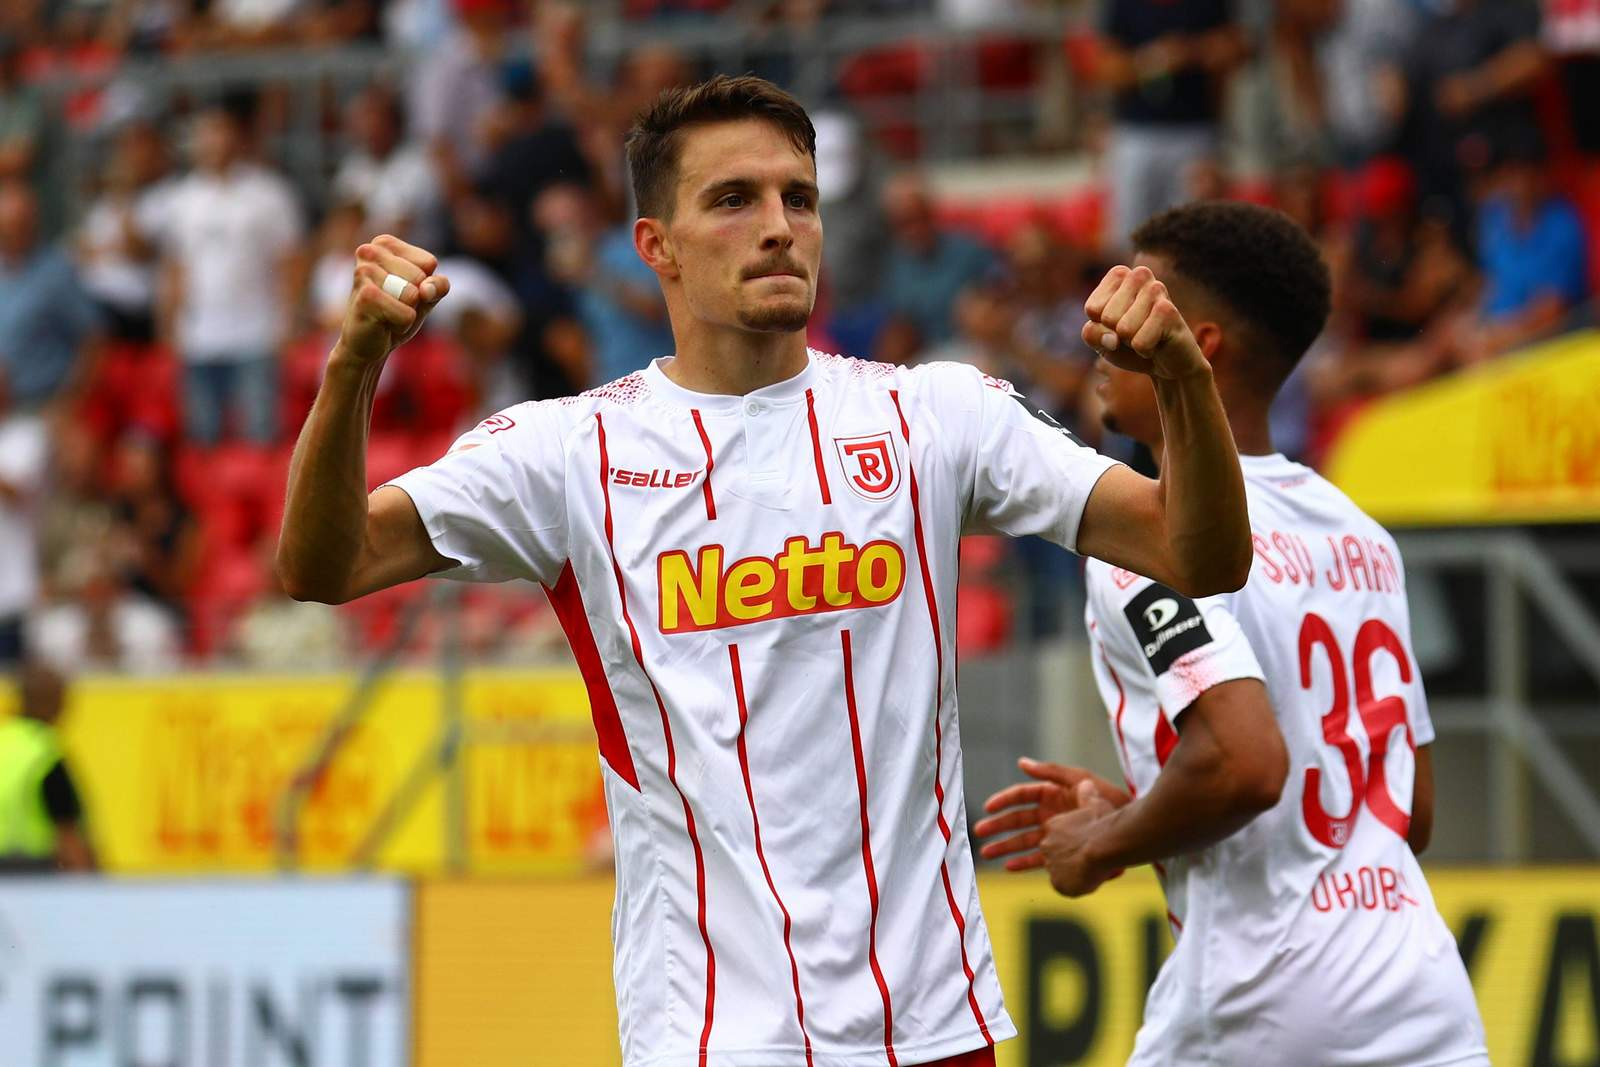 Sebastian Stolze von Jahn Regensburg